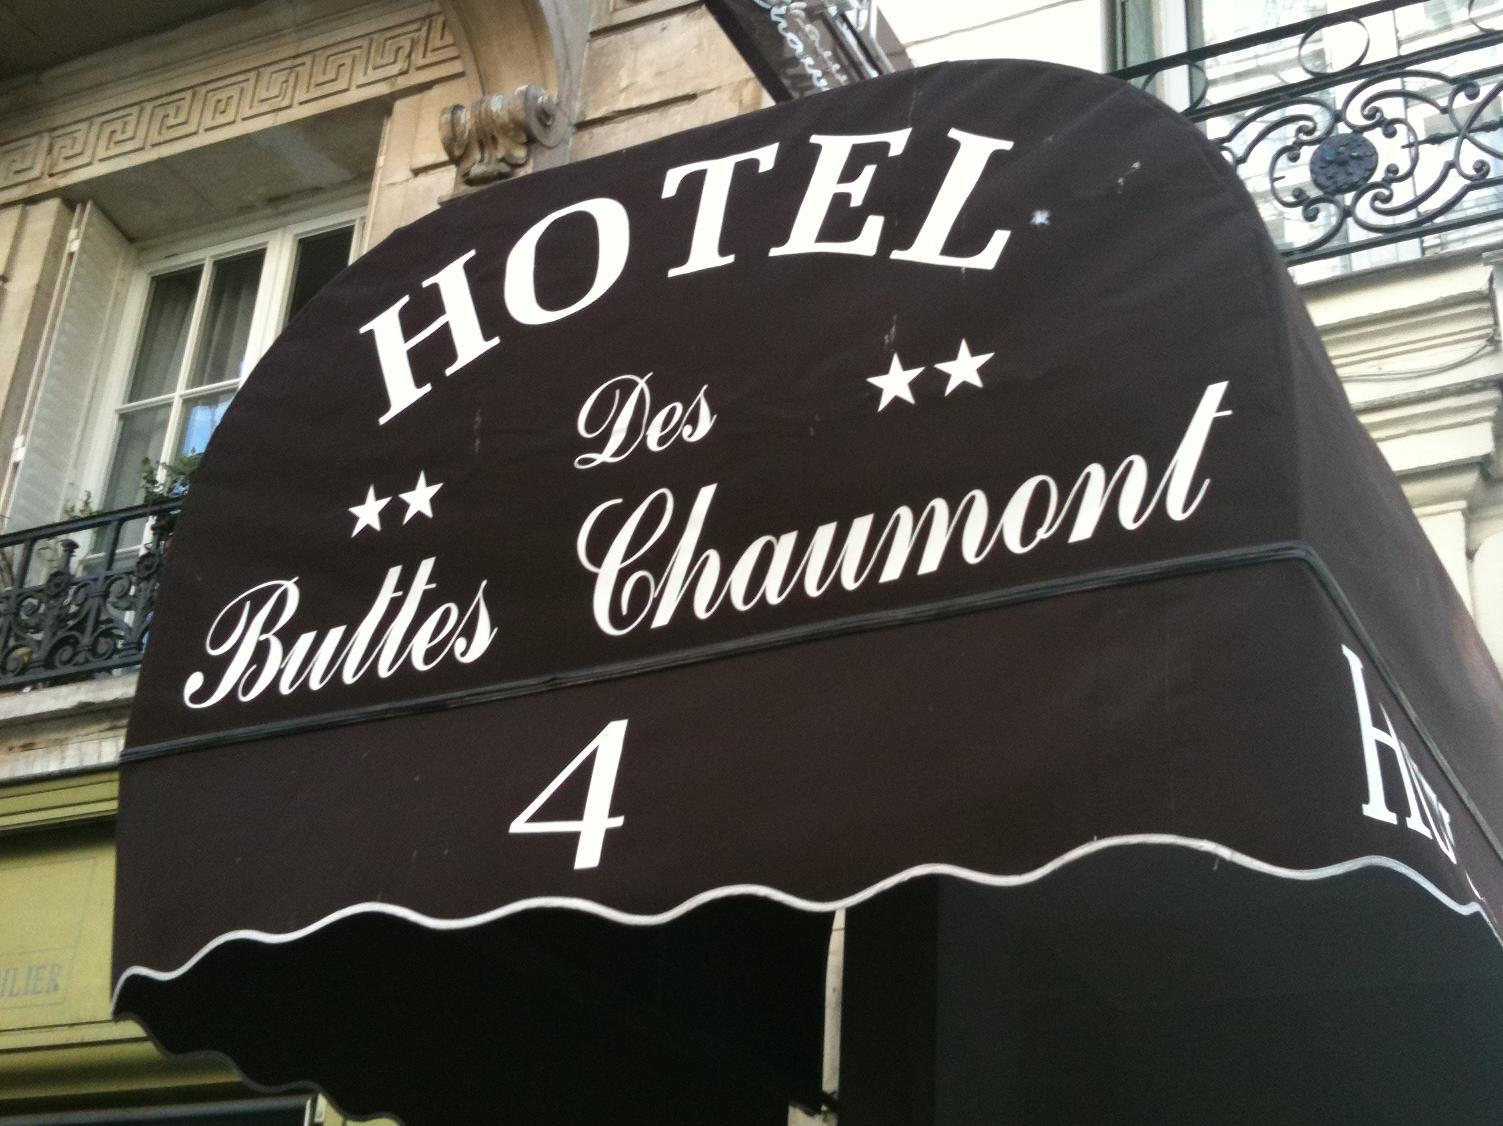 Hotel Buttes Chaumont - Hotell och Boende i Frankrike i Europa